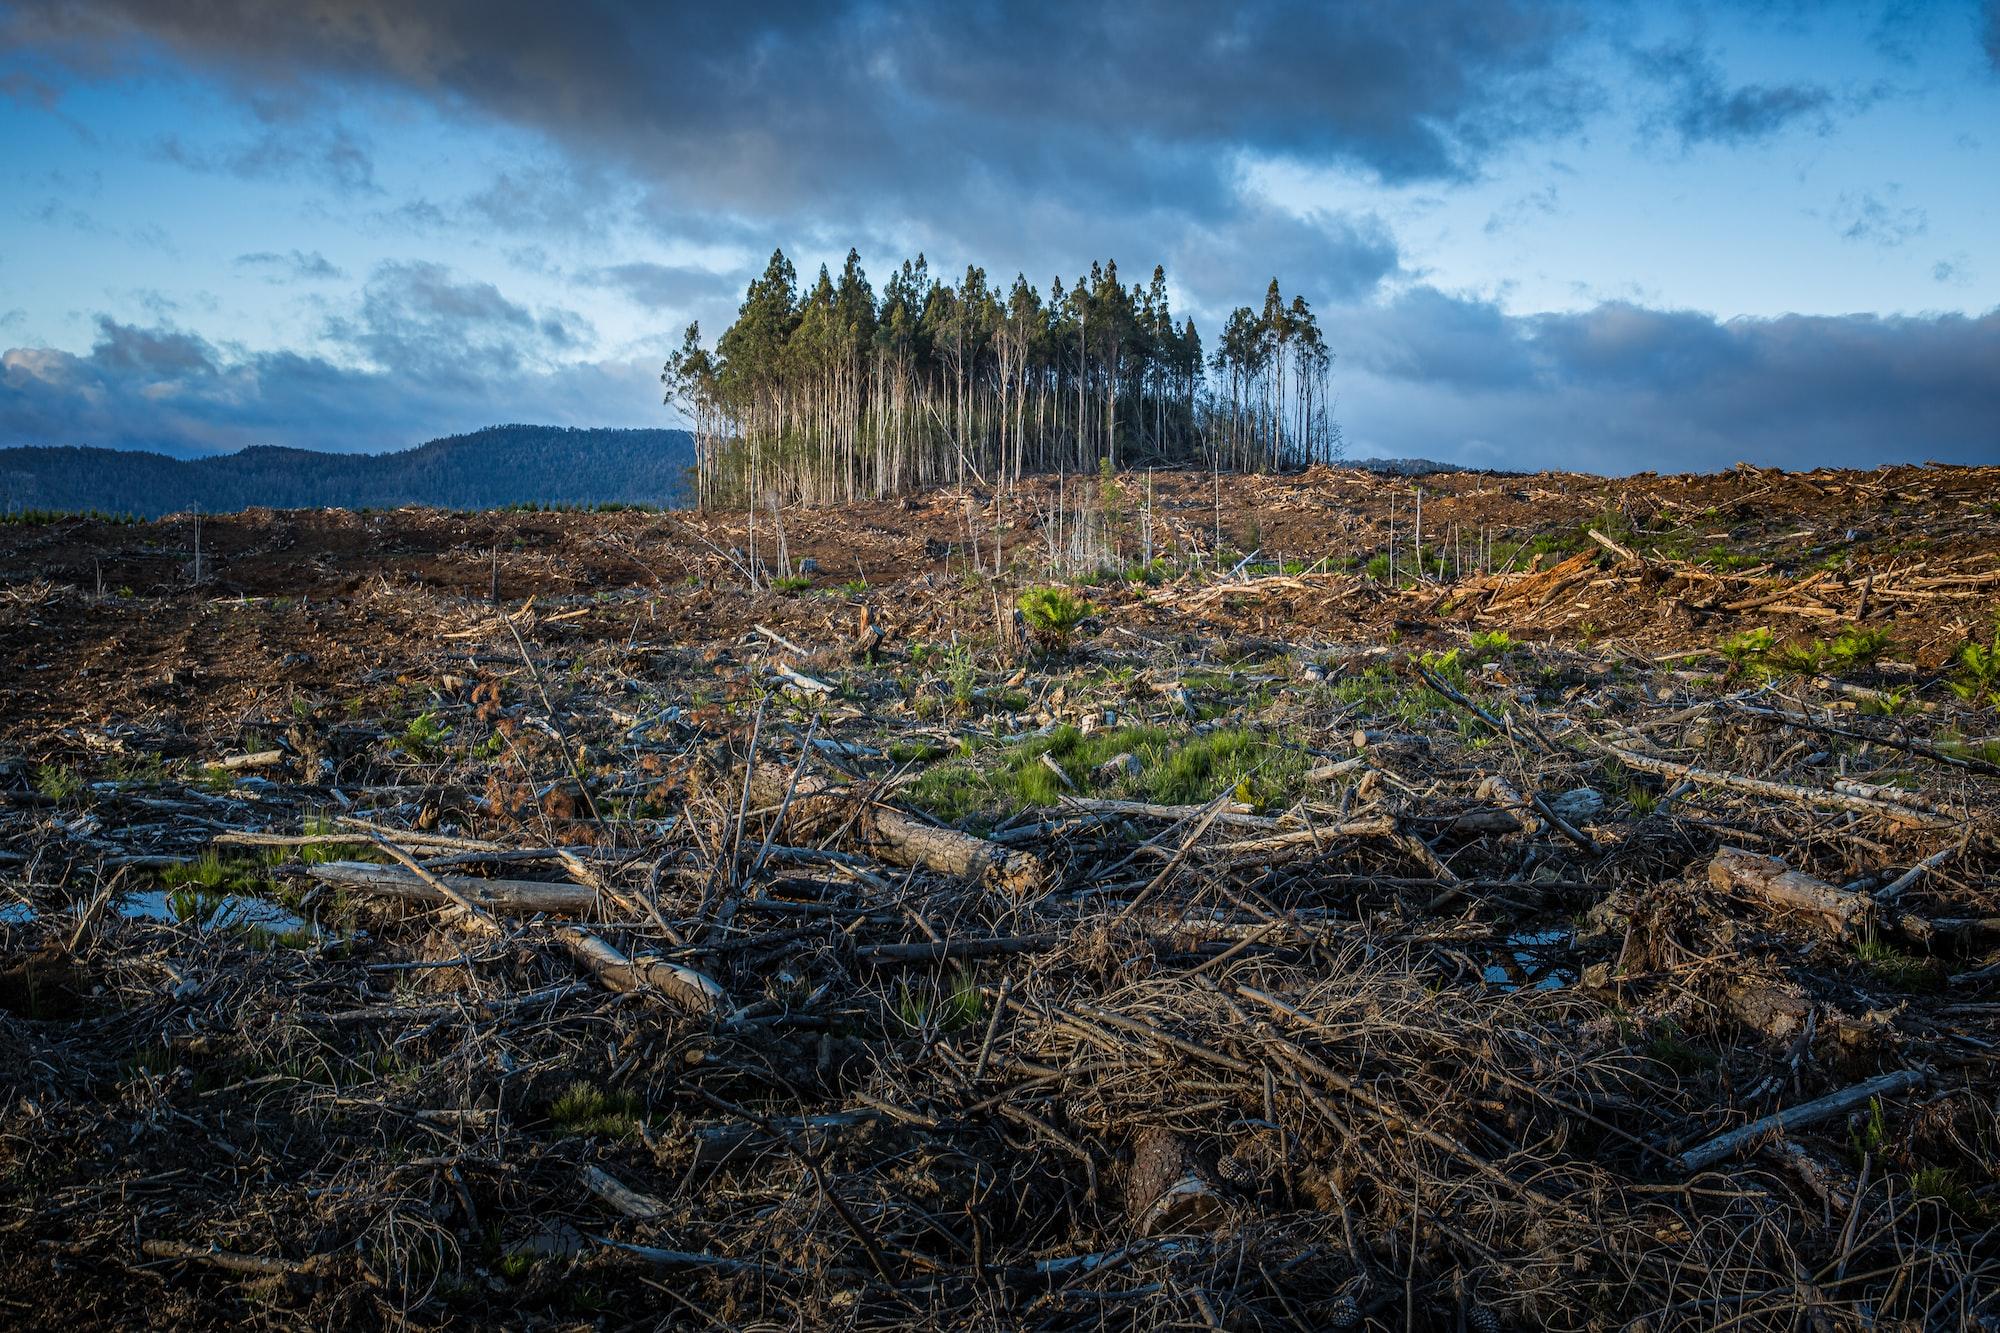 Forestry activities in Tasmania, Australia.